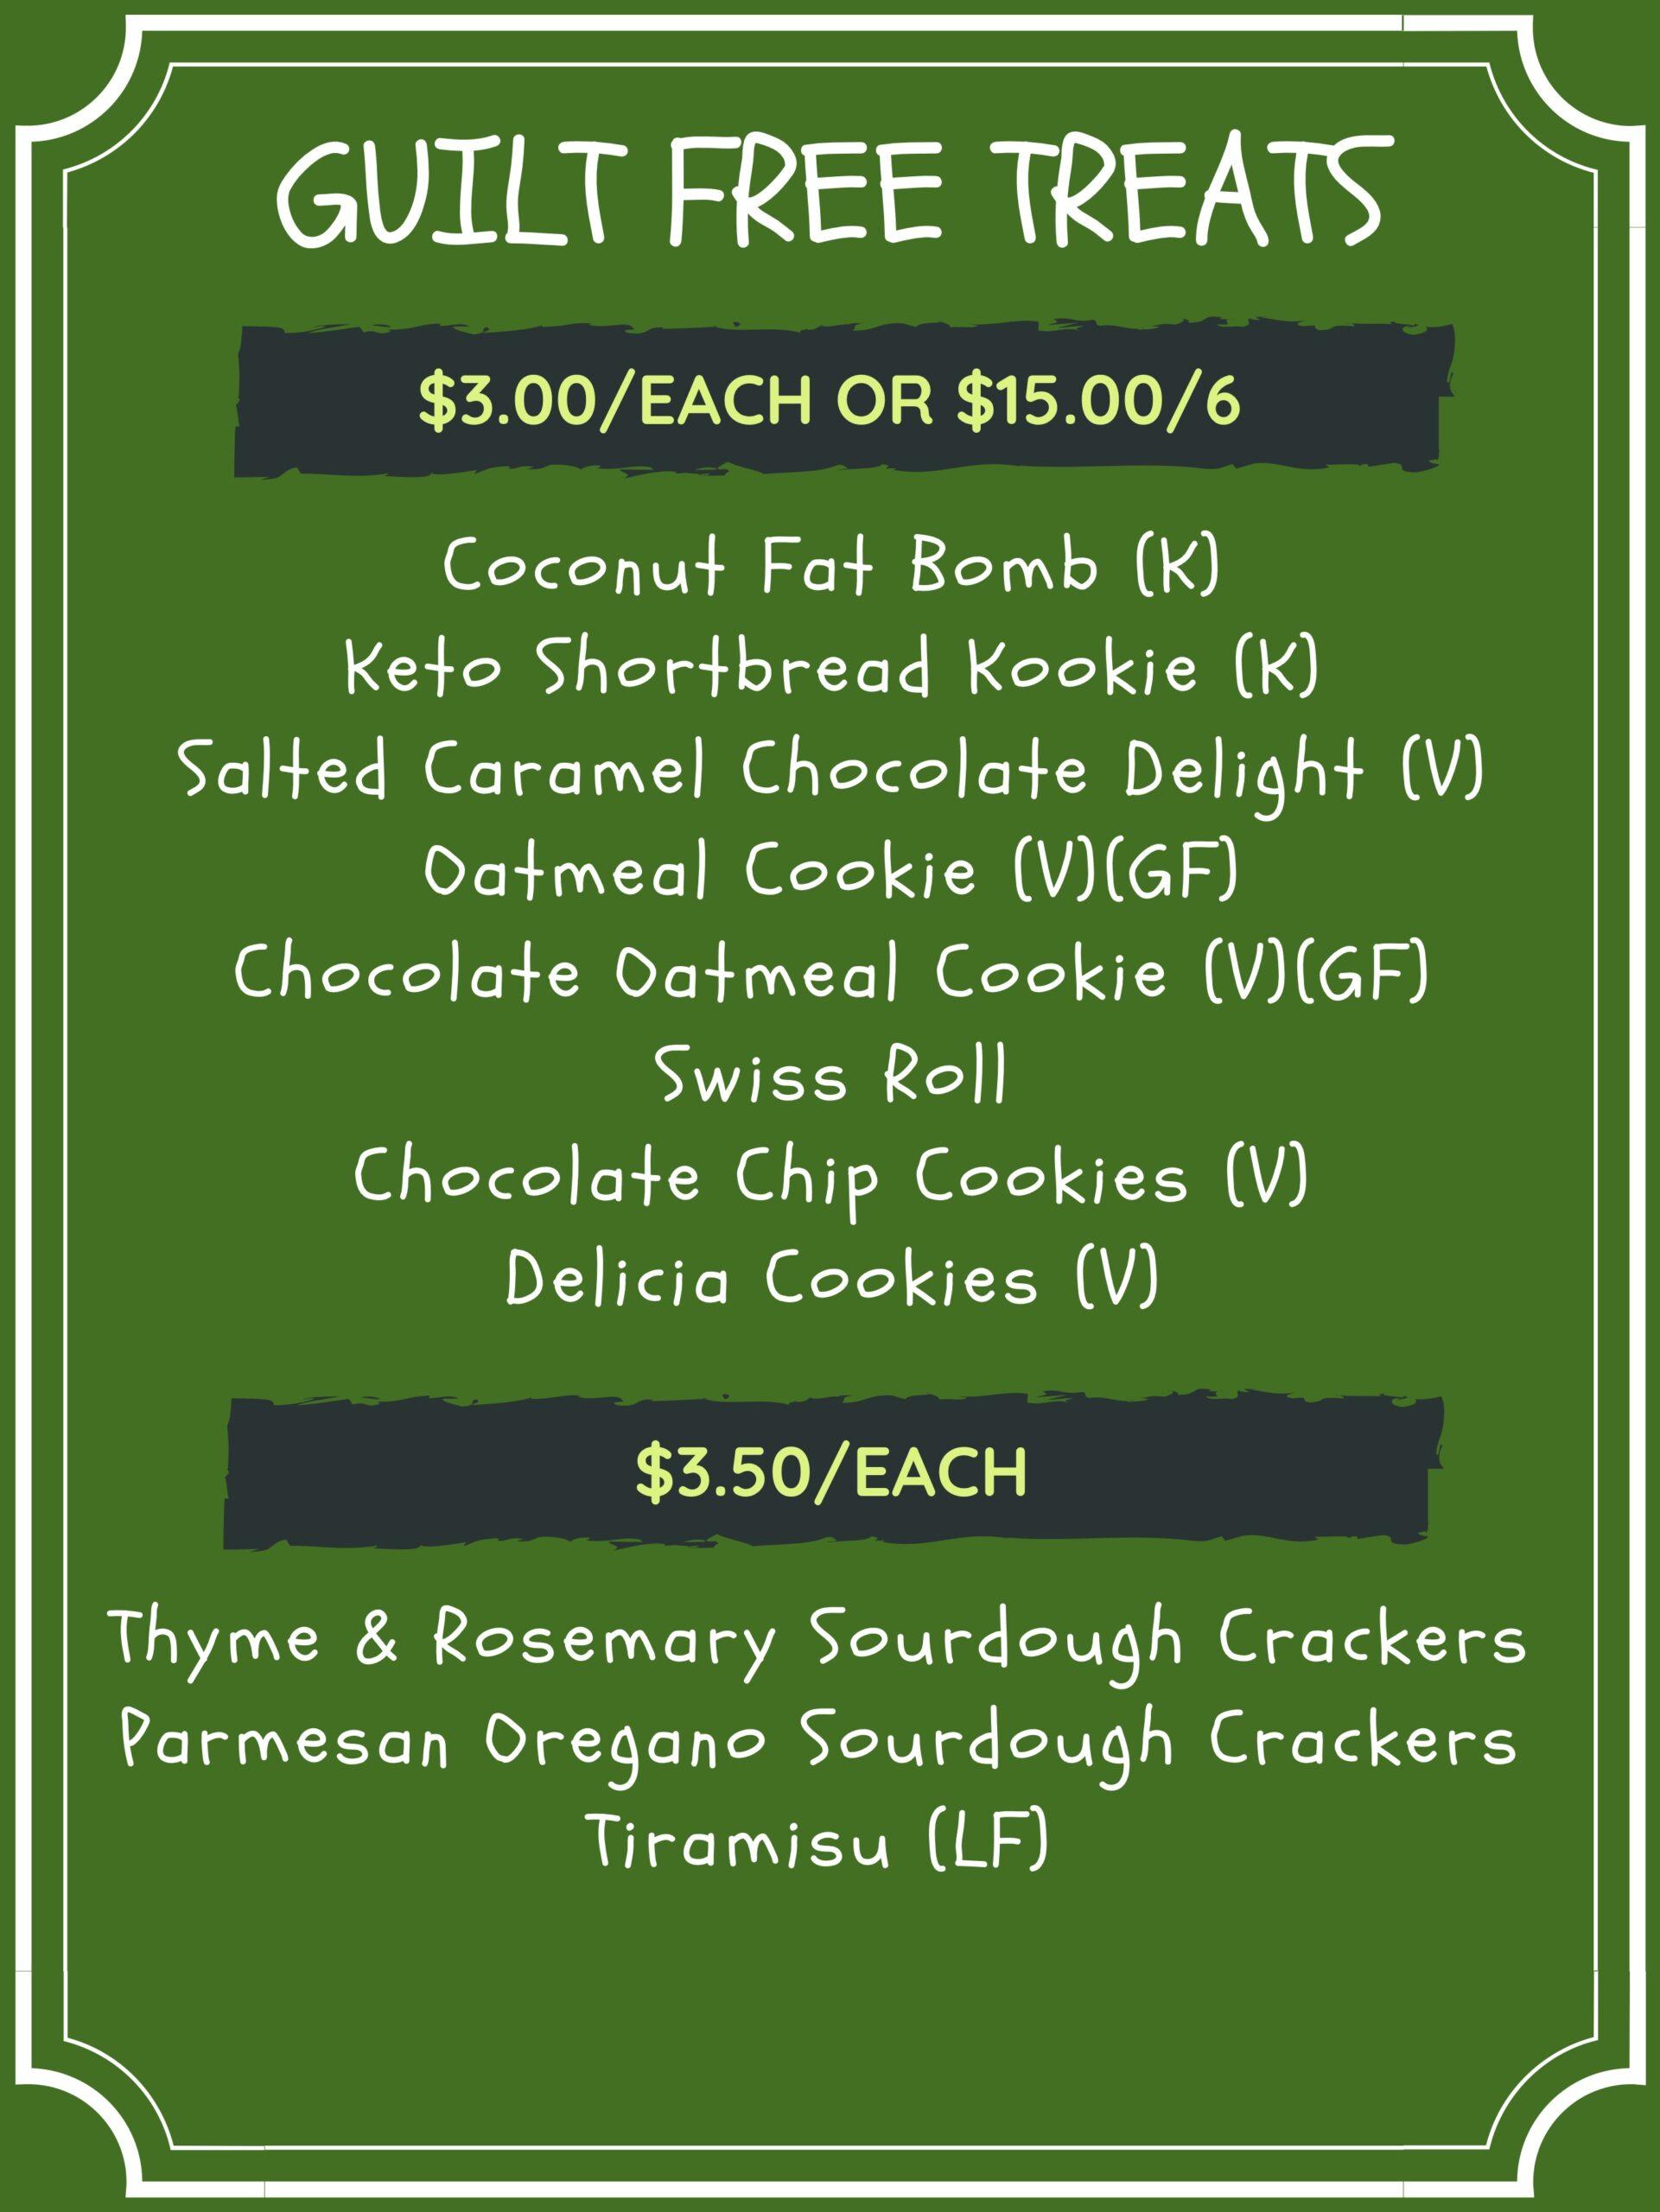 guilt-free-treats-menu